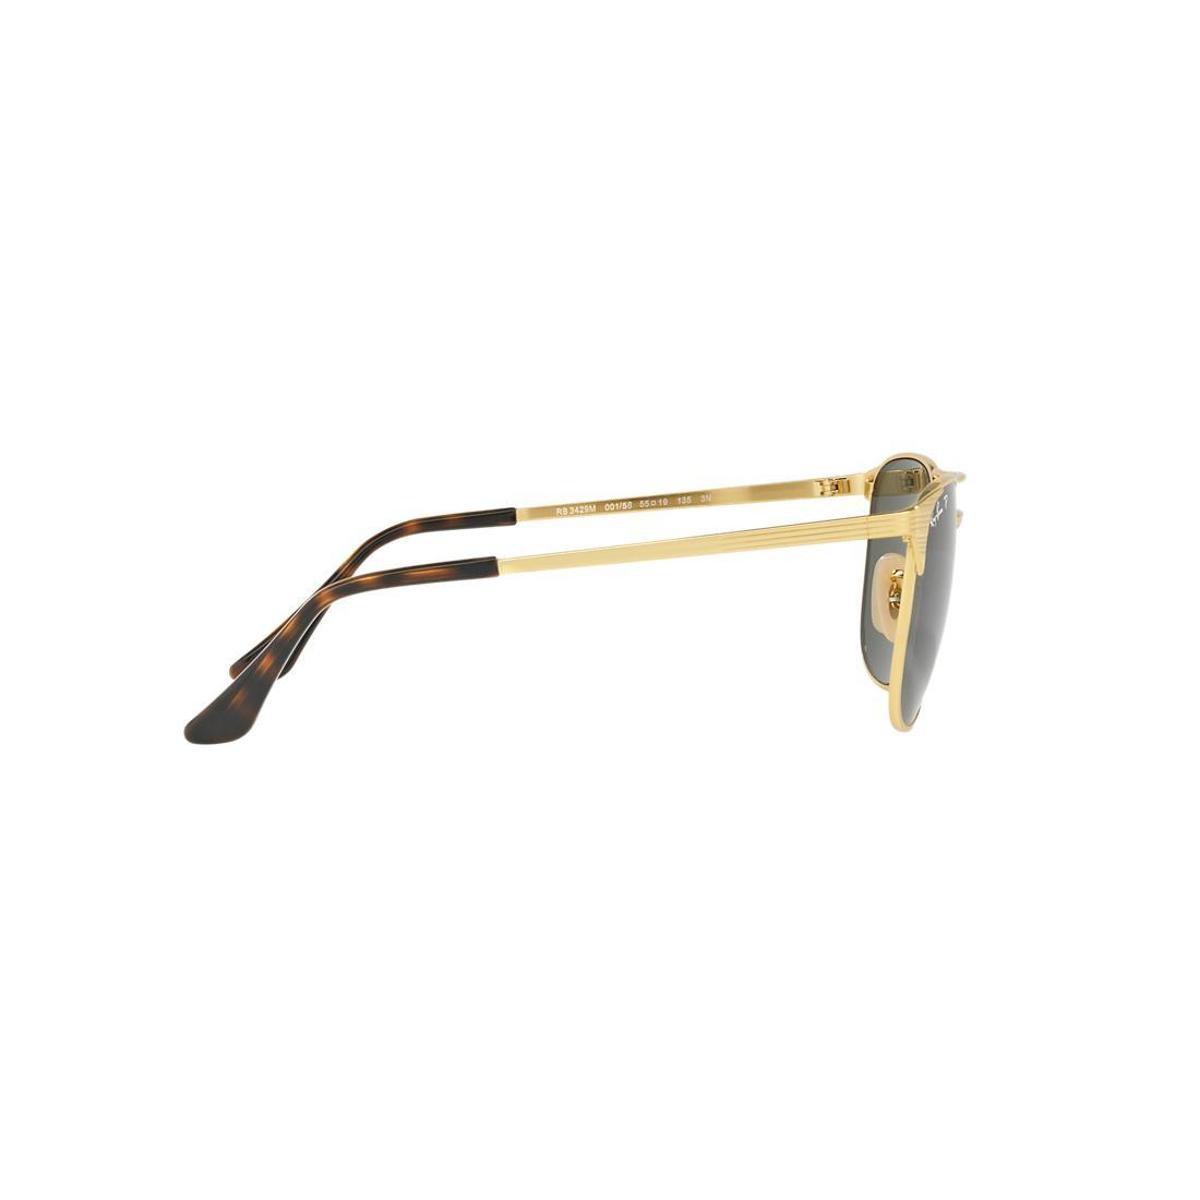 8dcc2ac637702 Óculos de Sol Ray-Ban RB3429M Signet - Ouro - Compre Agora   Zattini